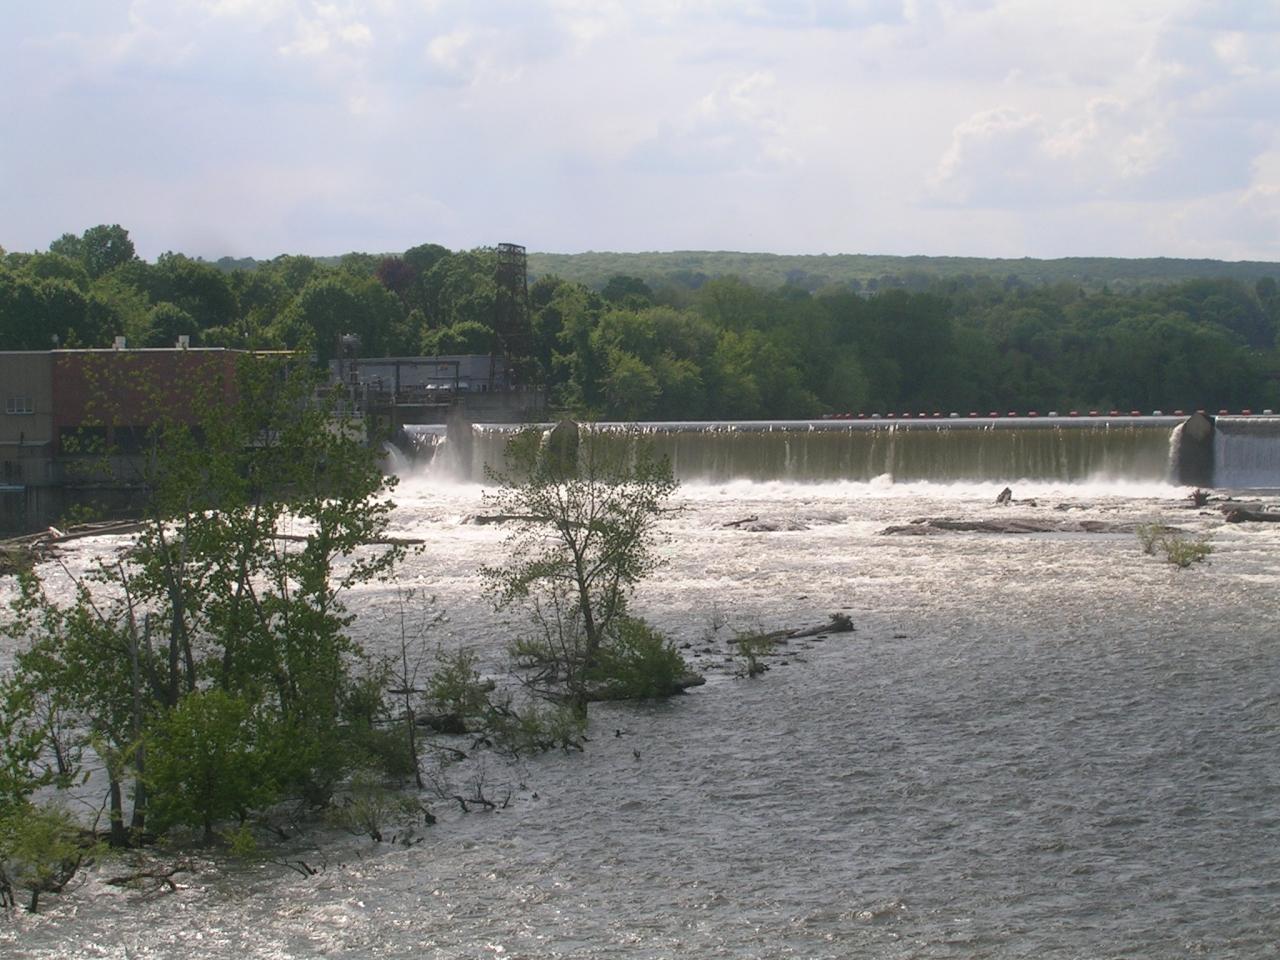 high flow over dam